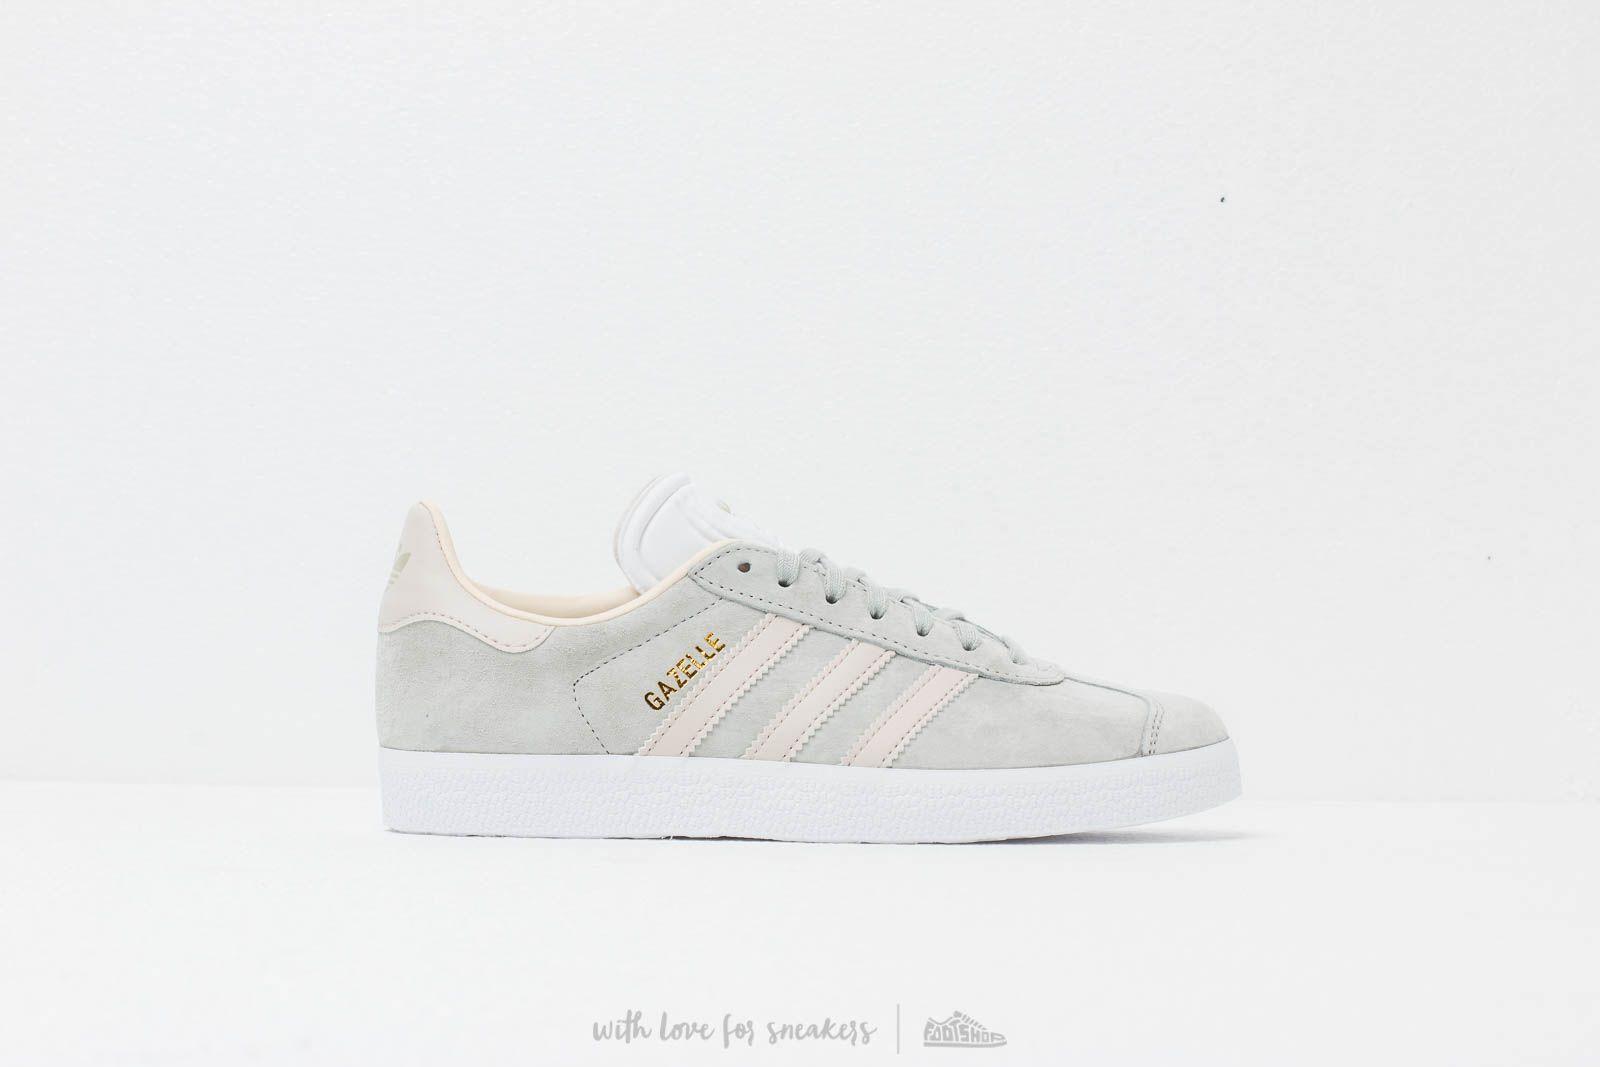 Adidas Gazelle W Ashsil Cream Brown Ecrtin